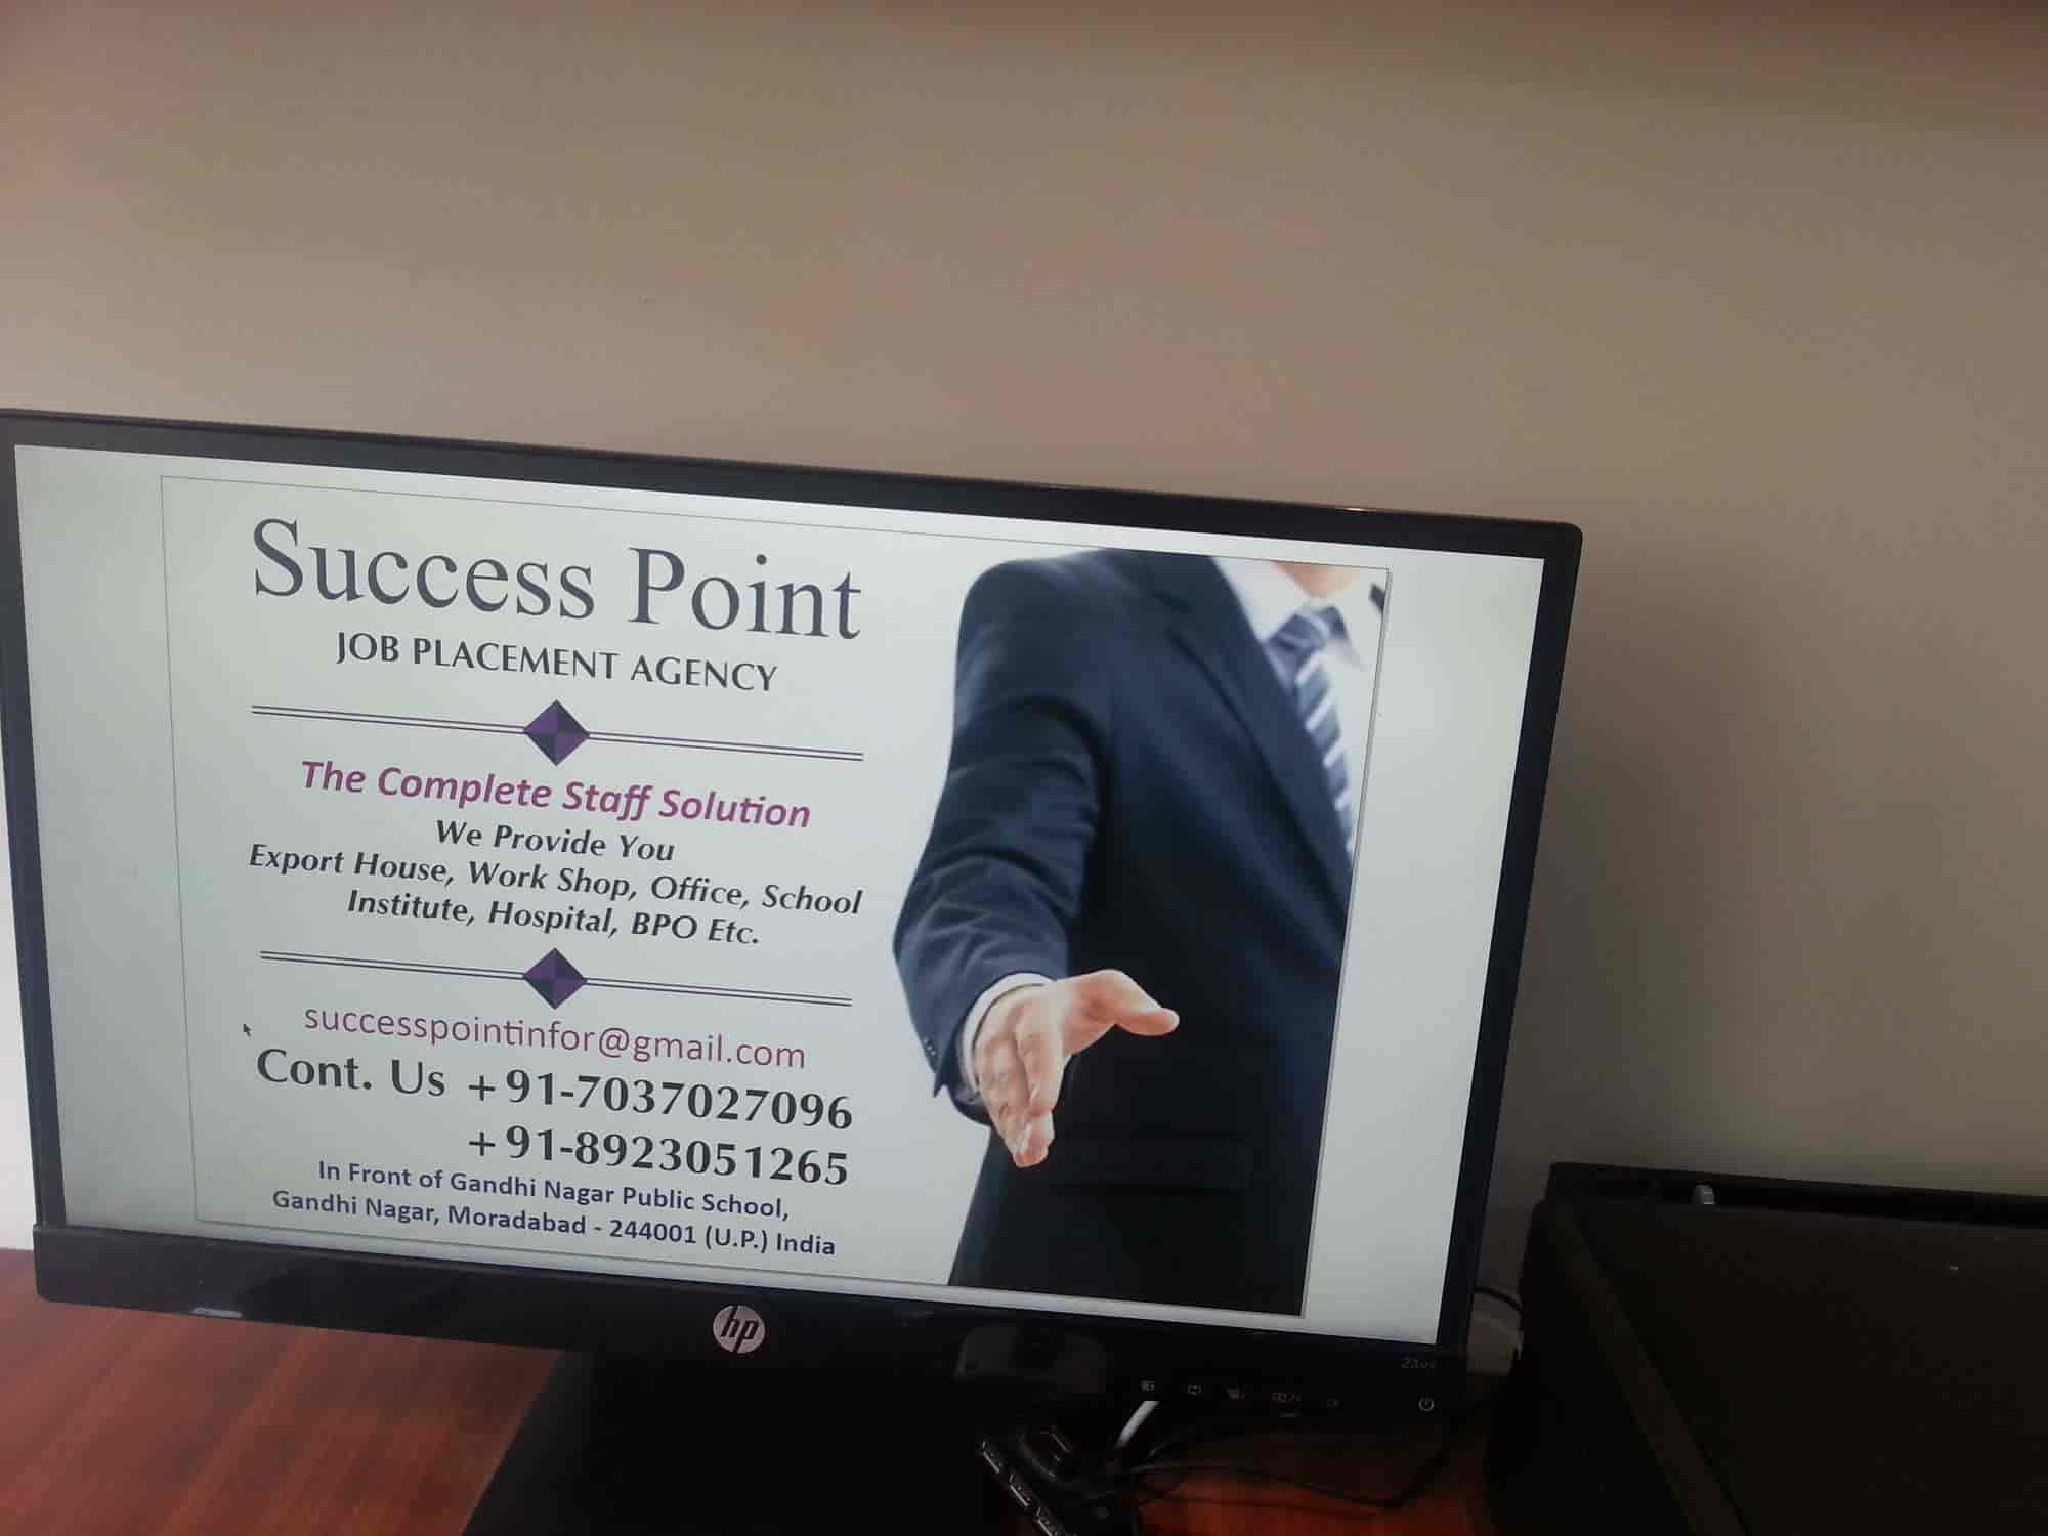 Success Point, Gandhi Nagar Public School - Placement